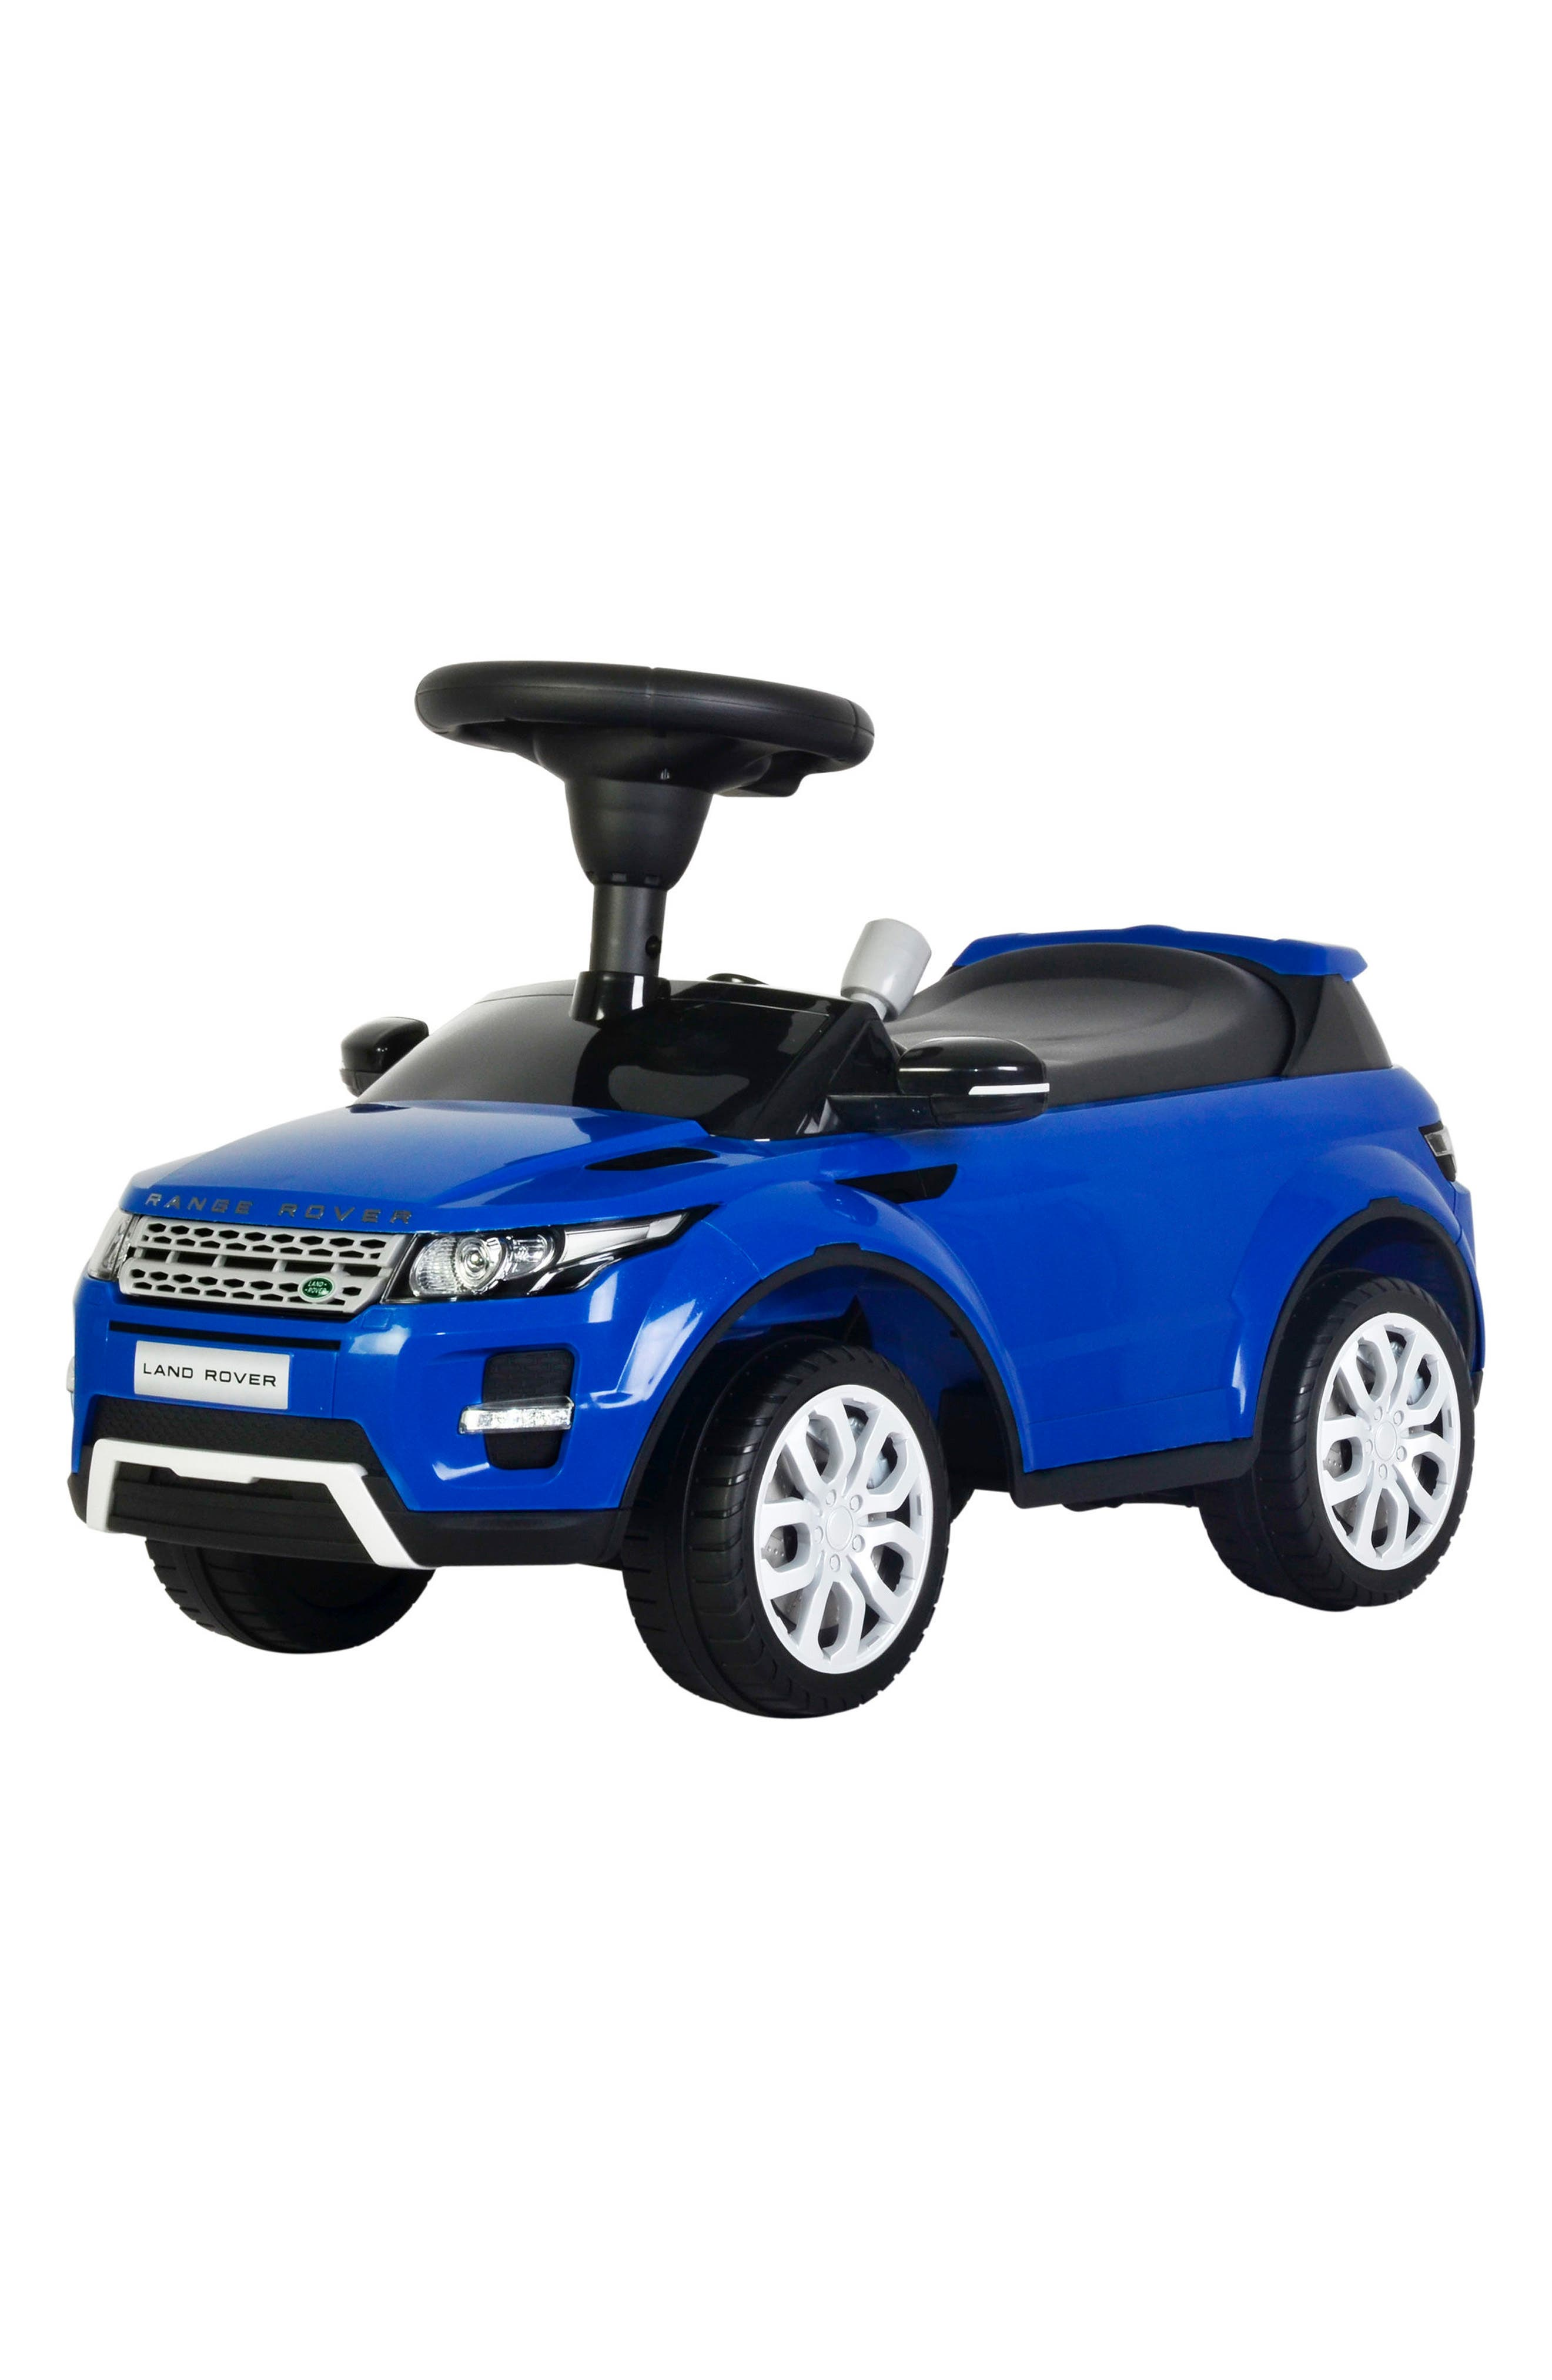 Range Rover Push Car,                             Main thumbnail 1, color,                             BLUE